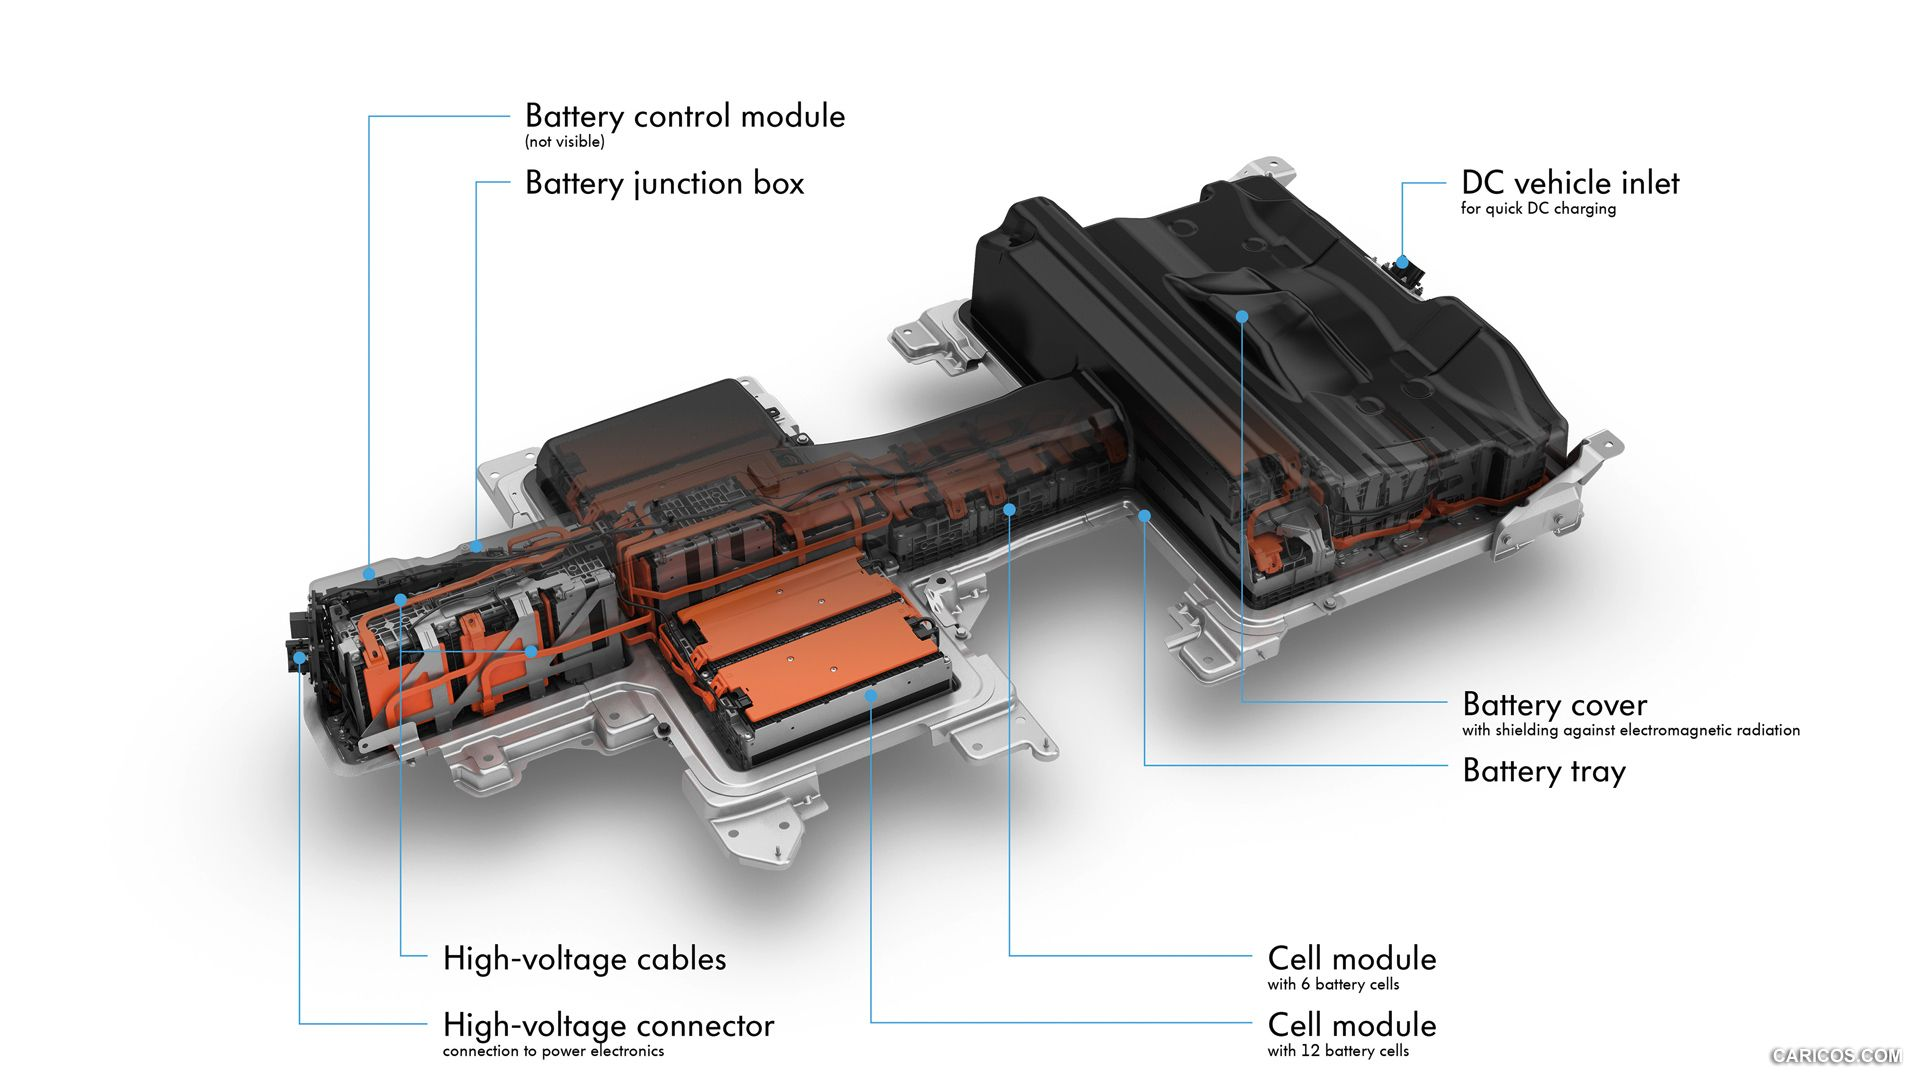 2015 Volkswagen E Golf Electric Car Conversion Car Battery Diy Car Projects